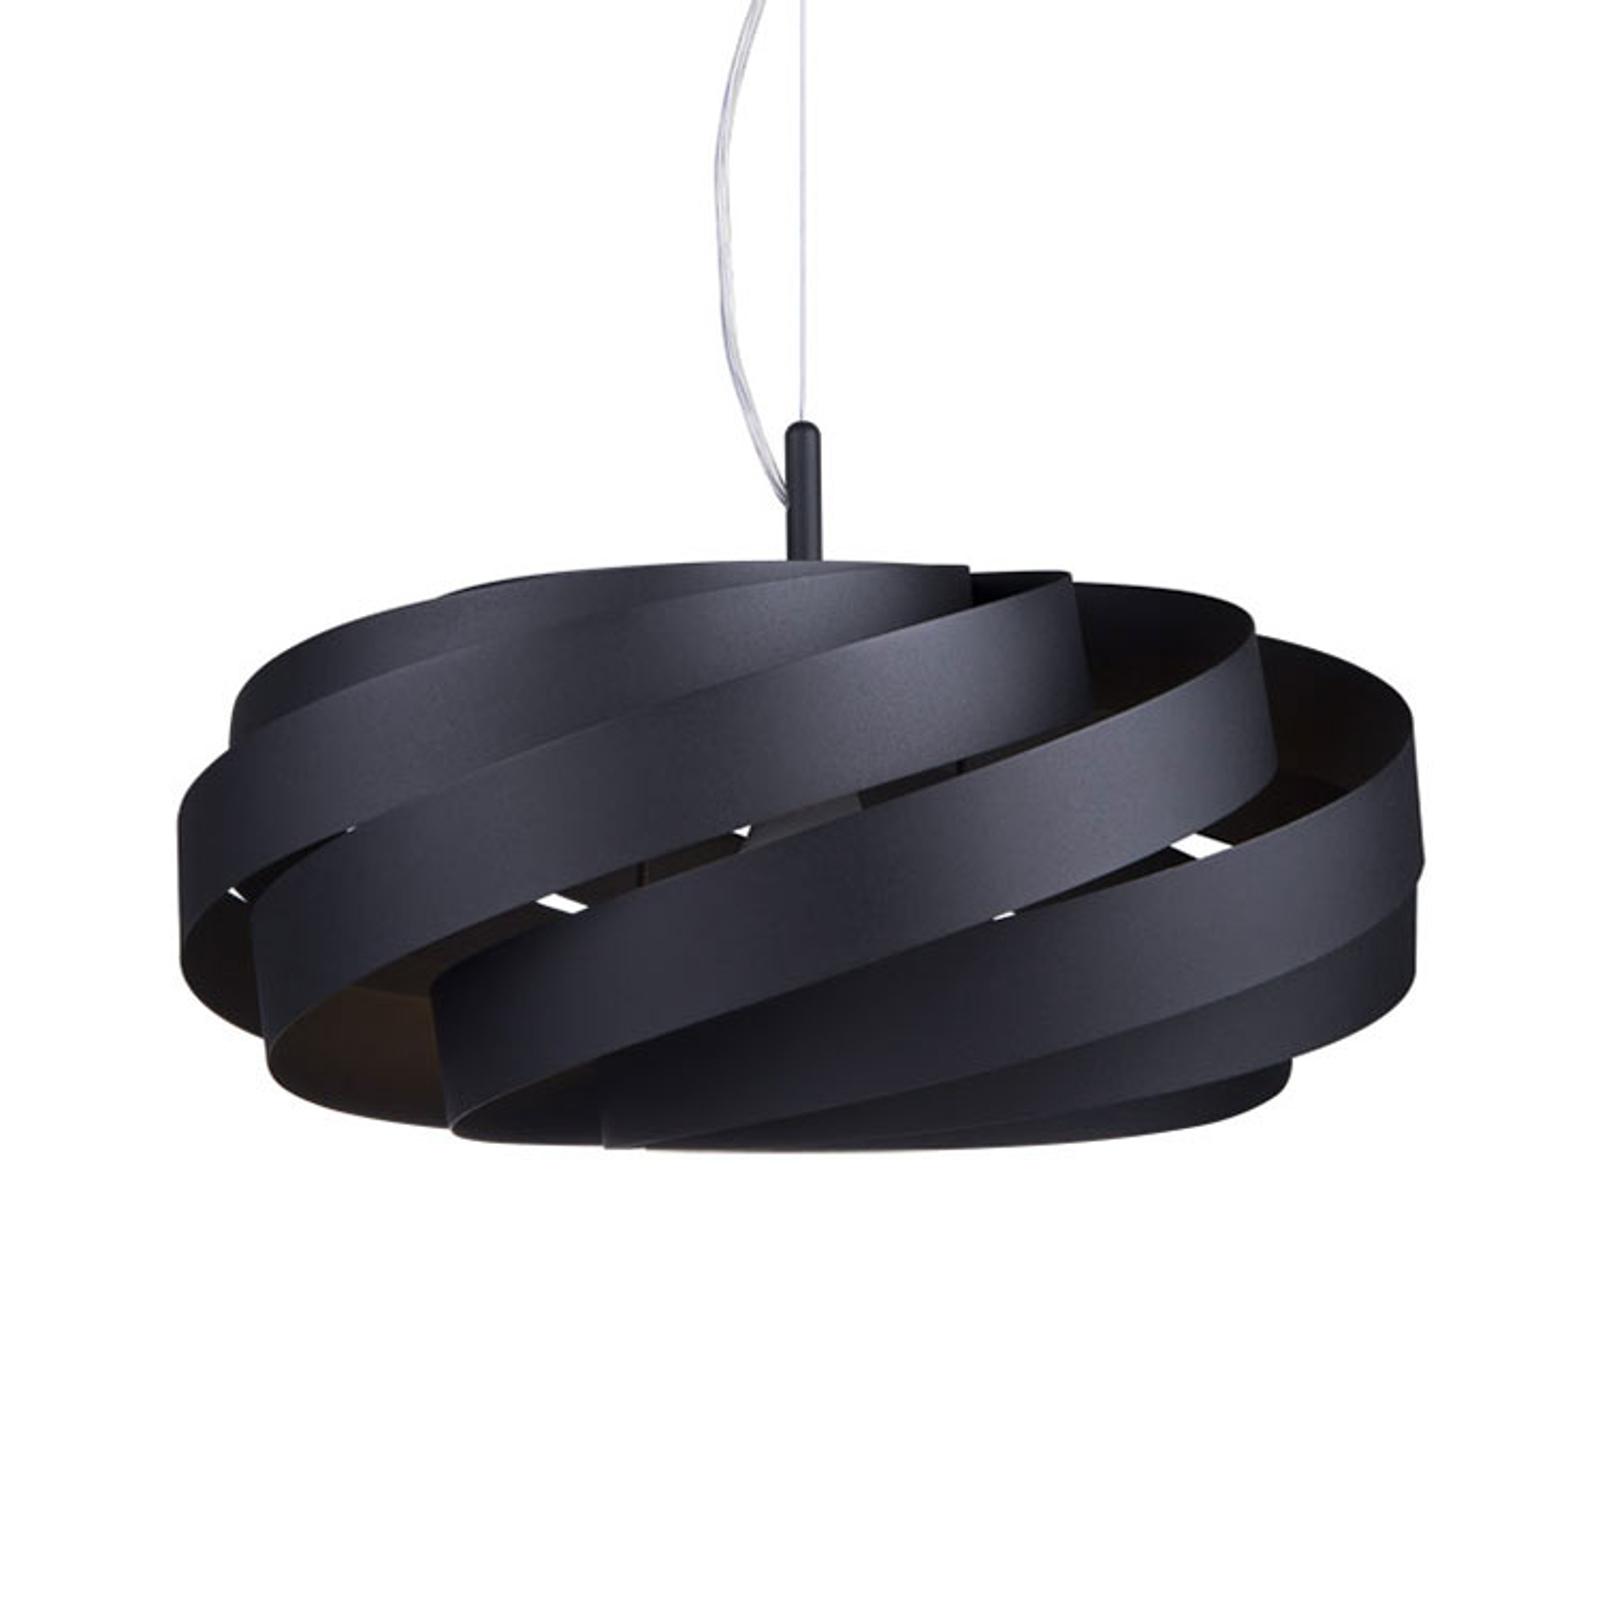 Riippuvalo Vento, musta, Ø 50 cm